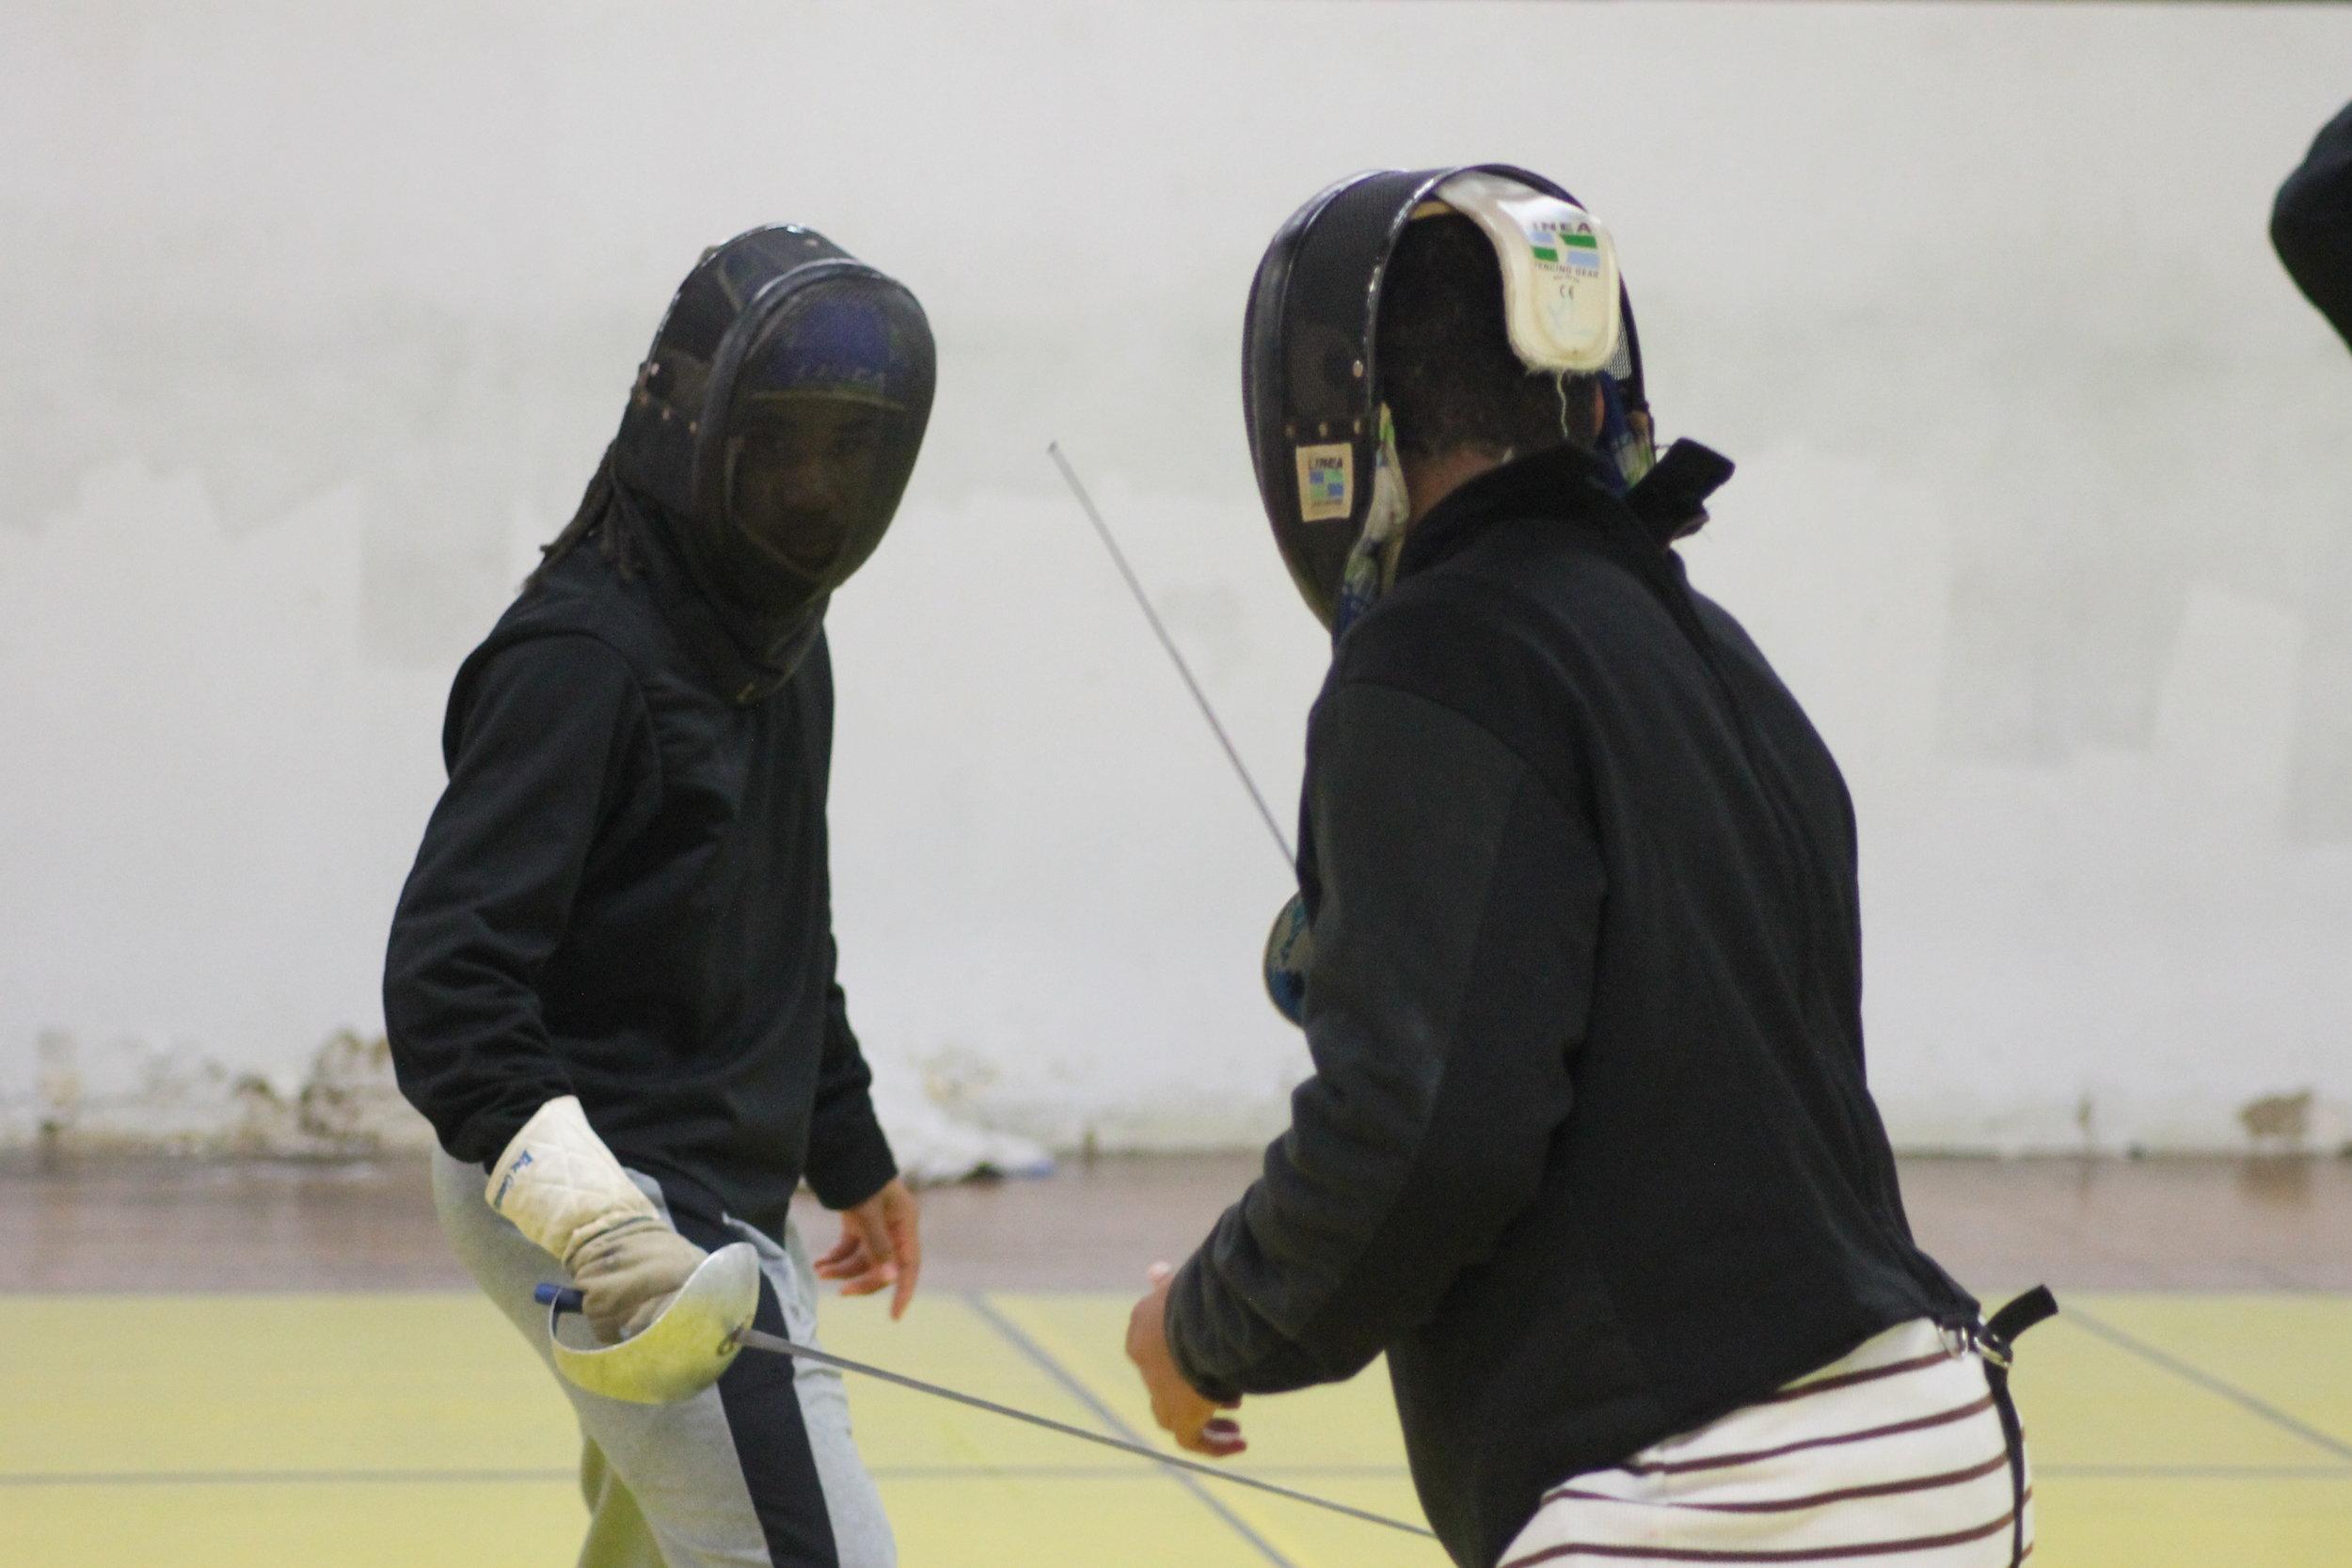 New Lens Urban Mentoring Society with Minnesota Swords Club Fencing #NewLensSociety 13.JPG